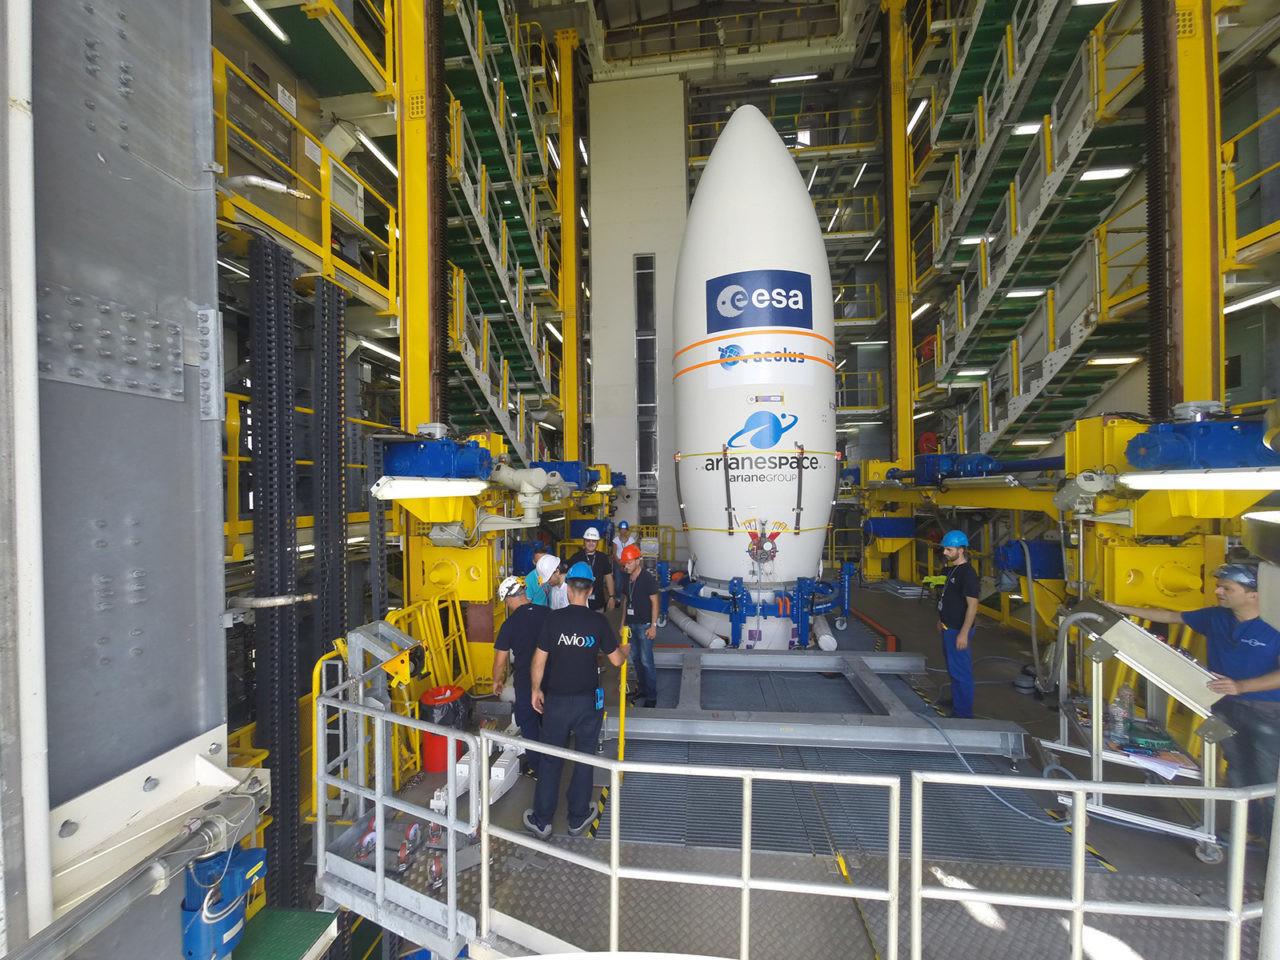 Le satellite Aeolus à bord d'une fusée Vega.